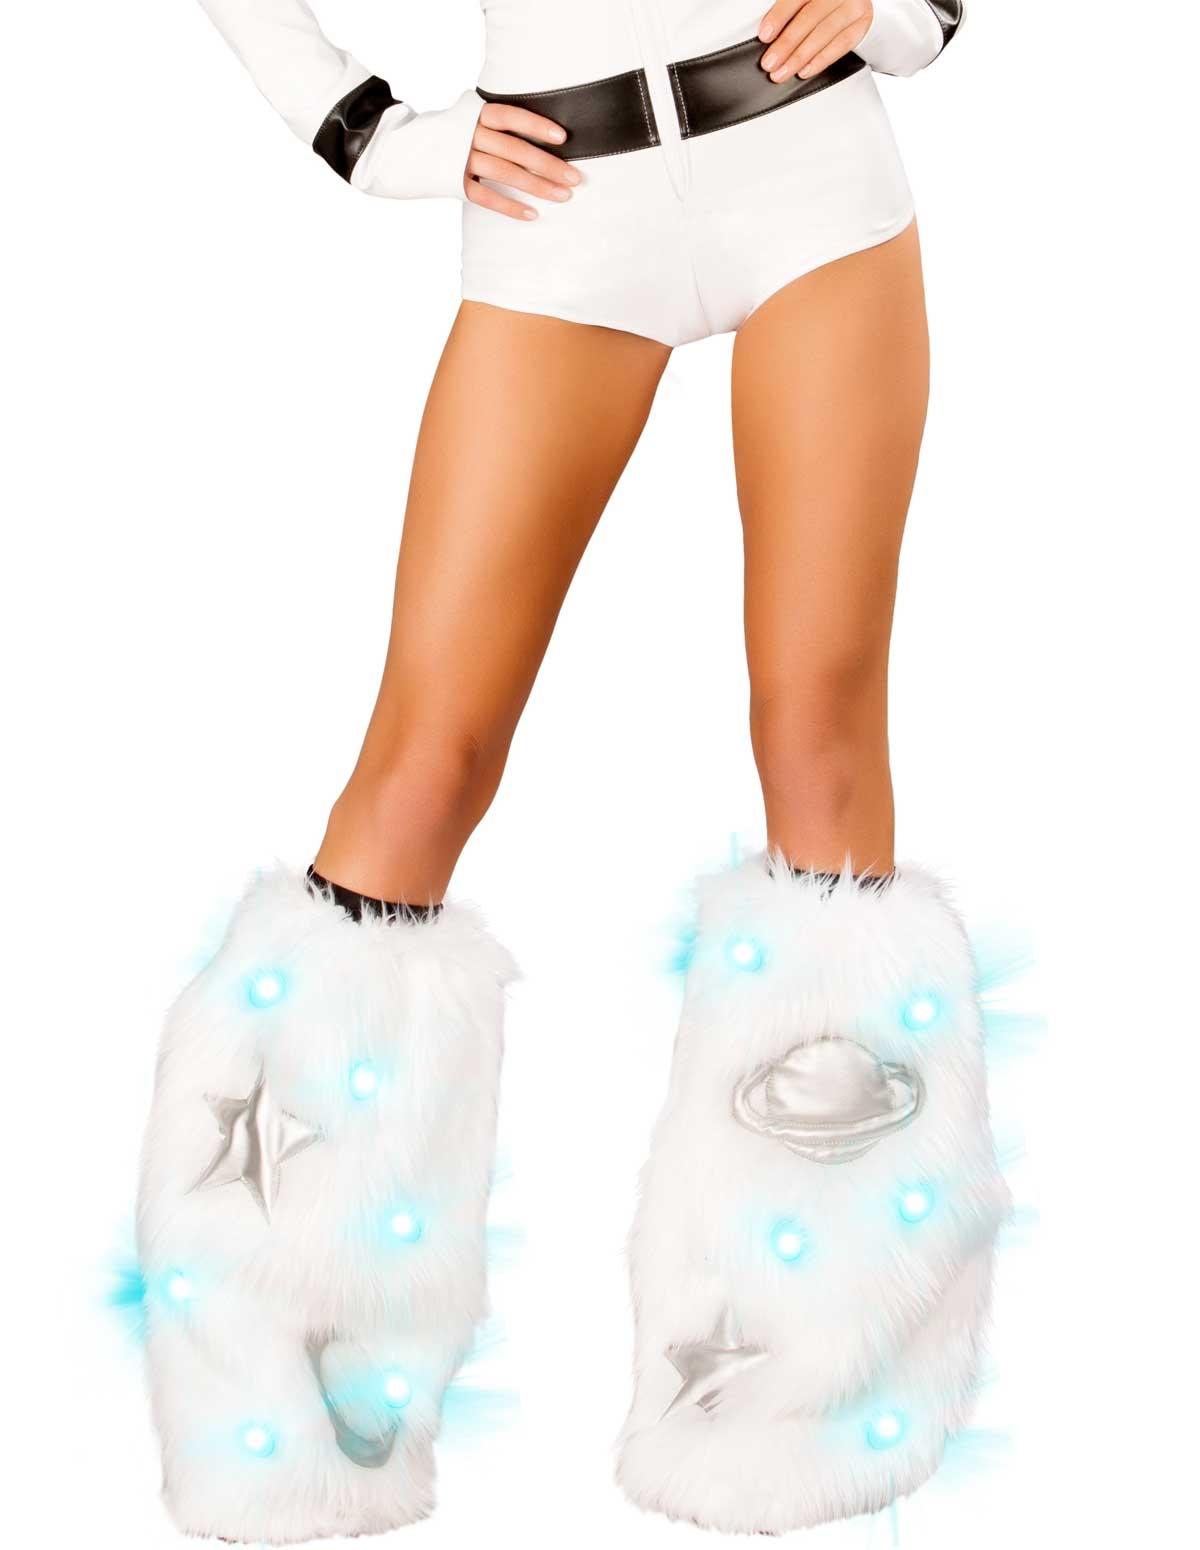 Astro Leg Warmers